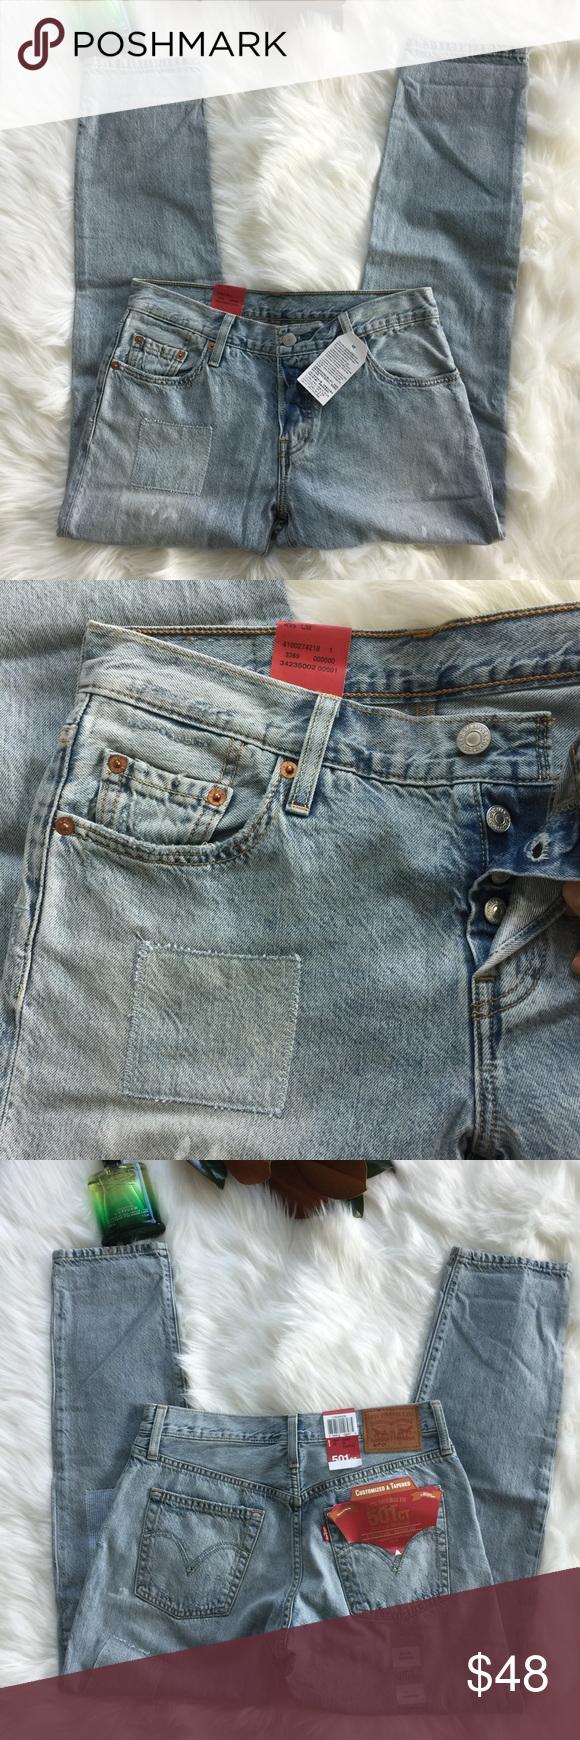 Hp Levis Bayan Cropped Jean Pantolon 501 Ct Nwt Clothes Design Fashion Fashion Design